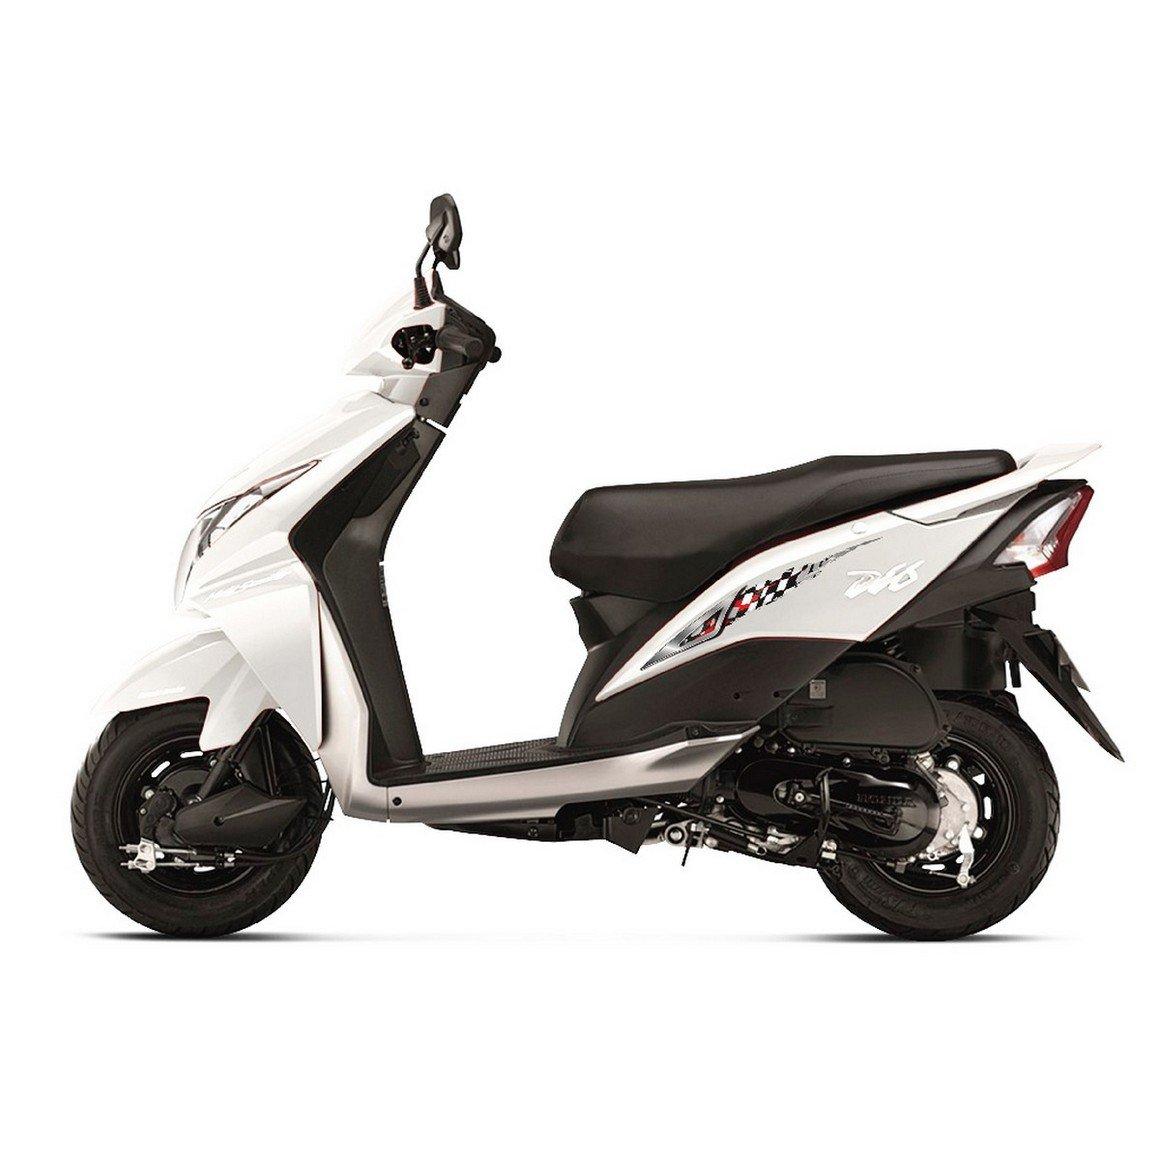 Autographix scooter universal sticker graphic accessories honda dio flagoff set of4 amazon in car motorbike